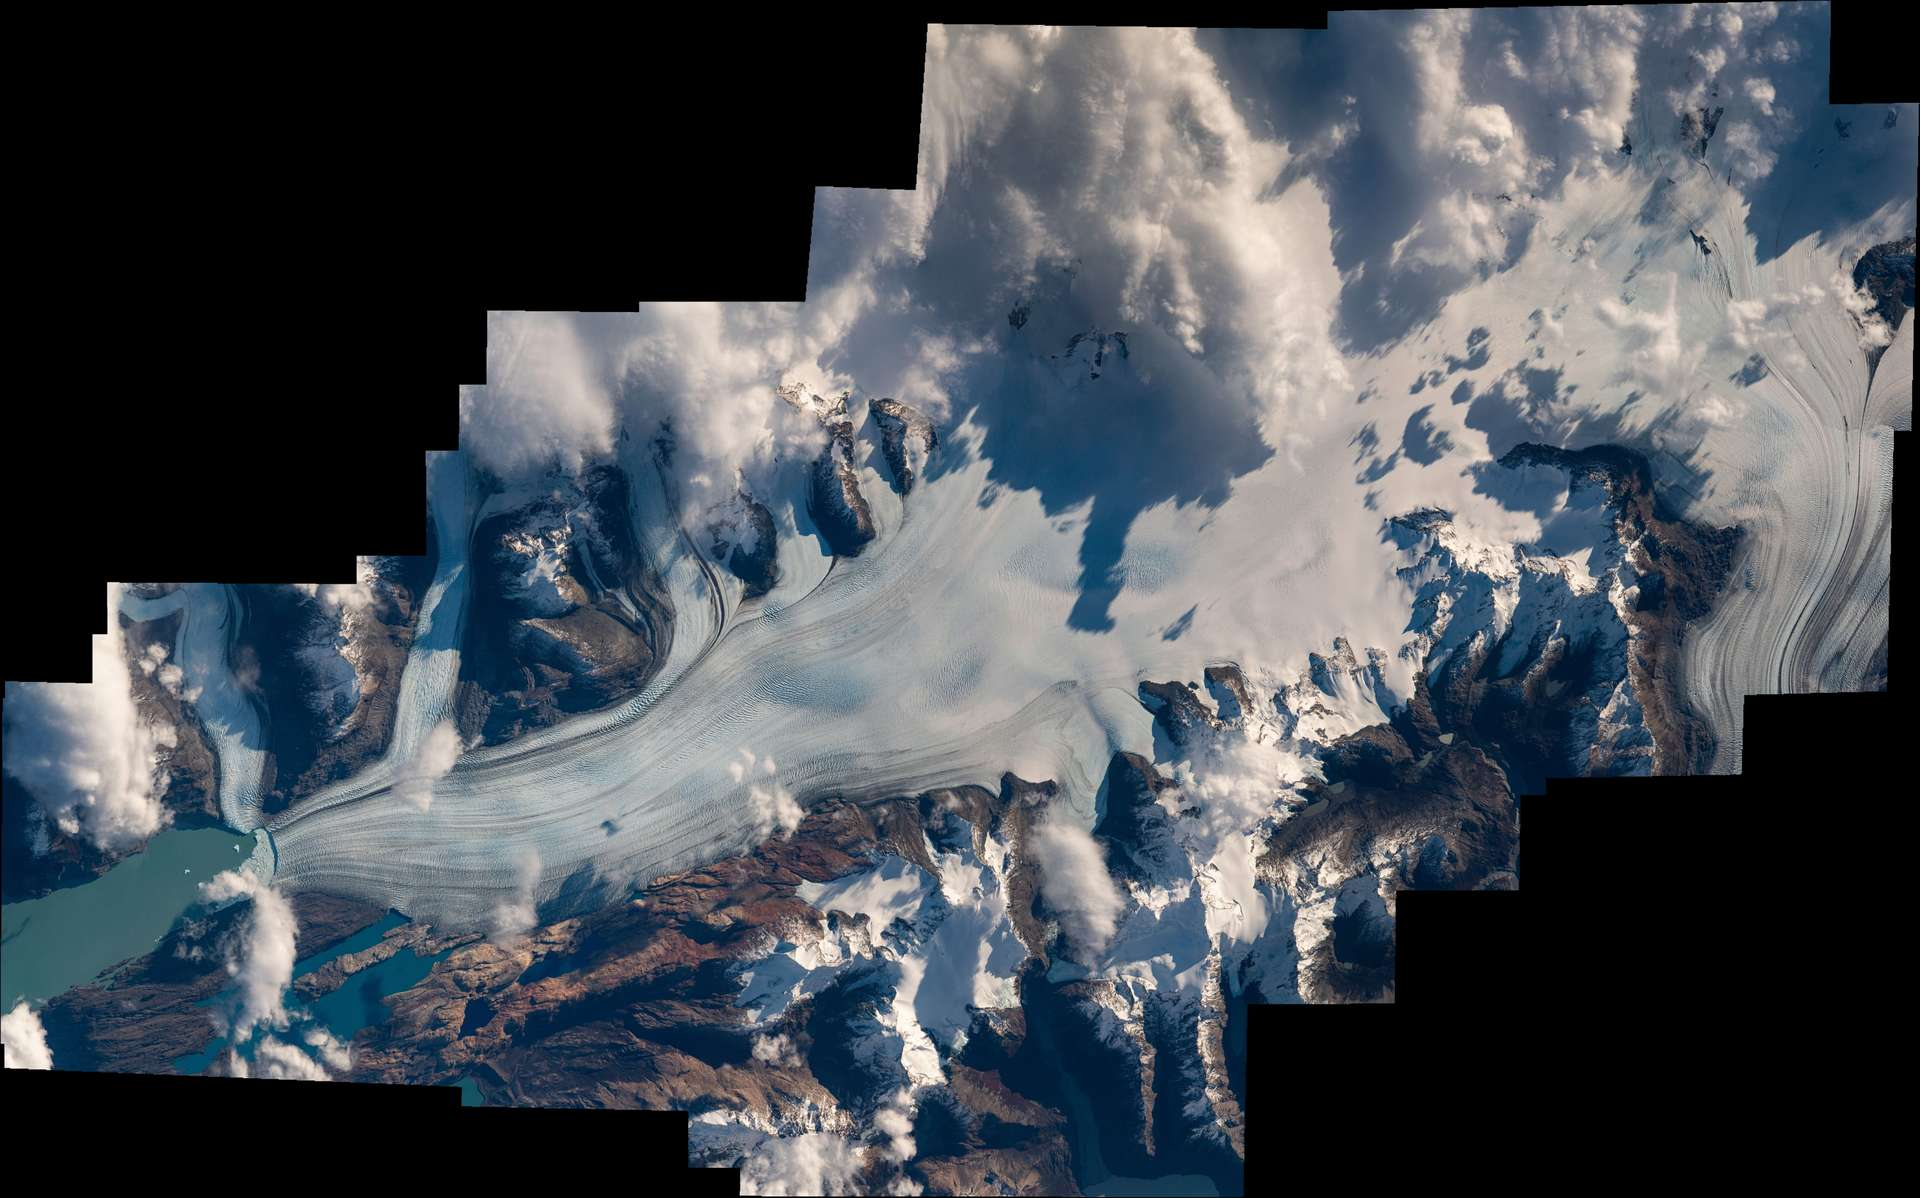 Le glacier Upsala, troisième plus grand glacier du Sud de la Patagonie. © ESA, Nasa, T. Pesquet, A. Conigli